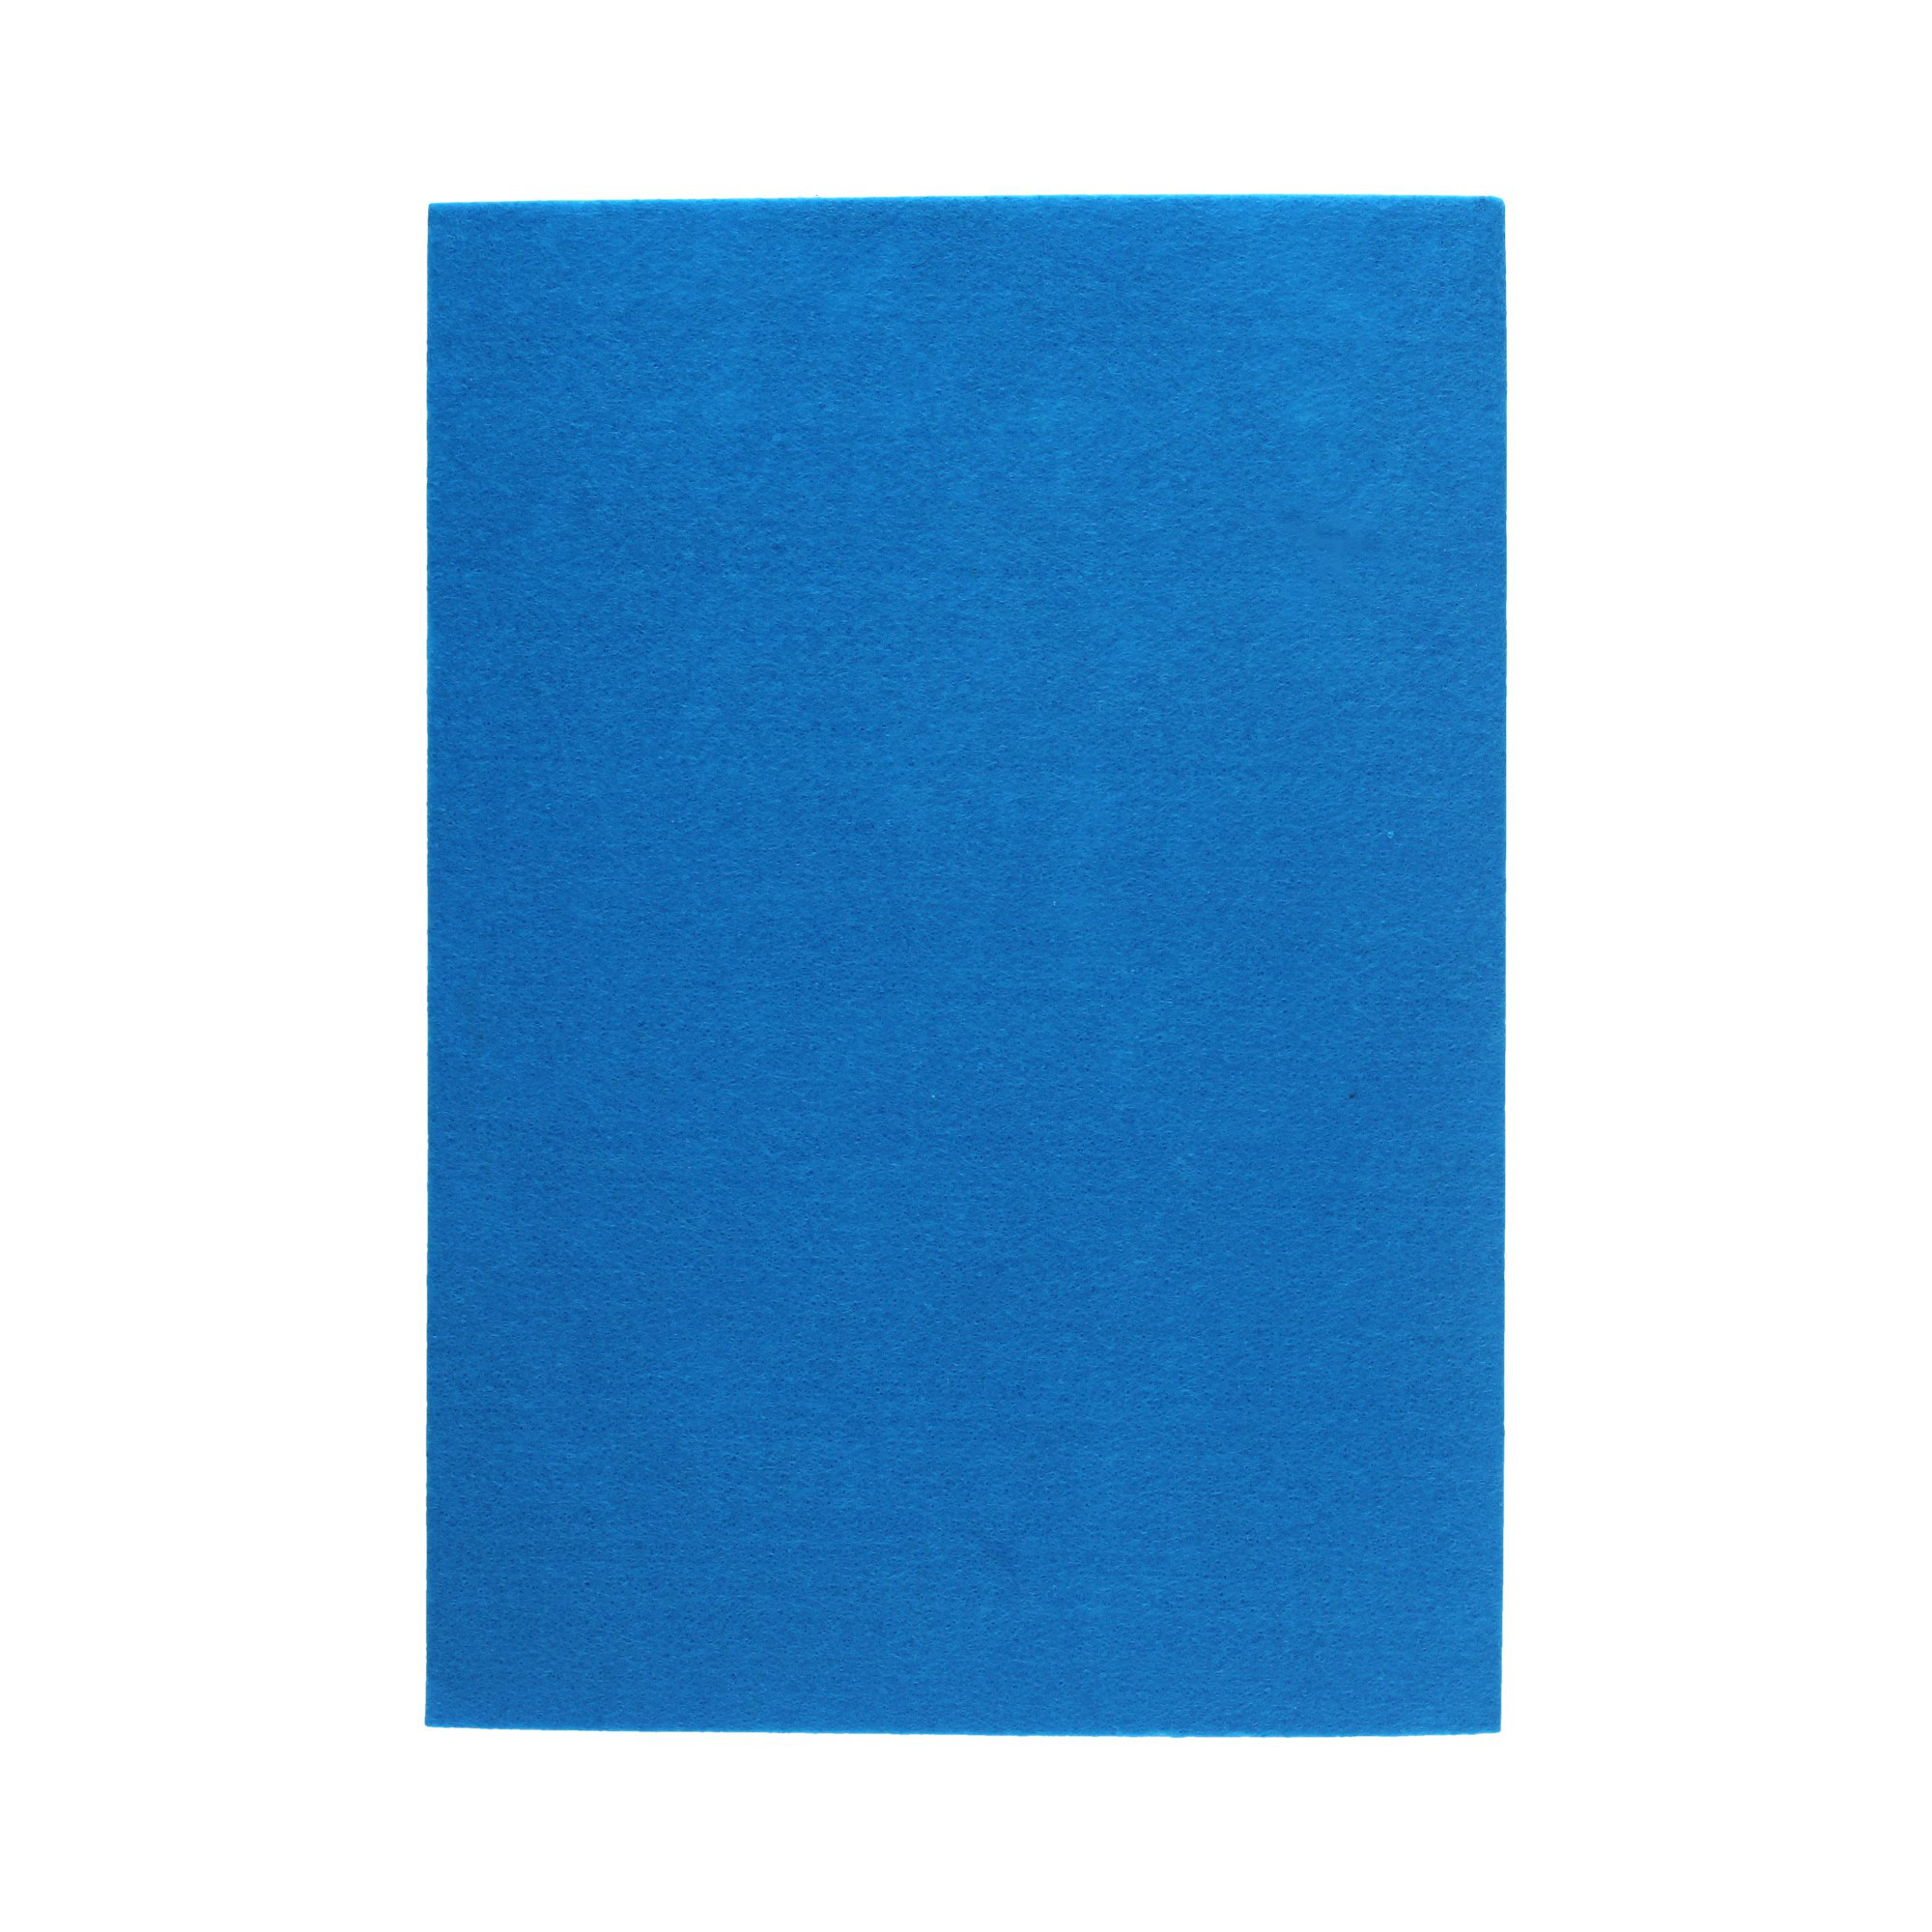 Filc niebieski Brewis (10)